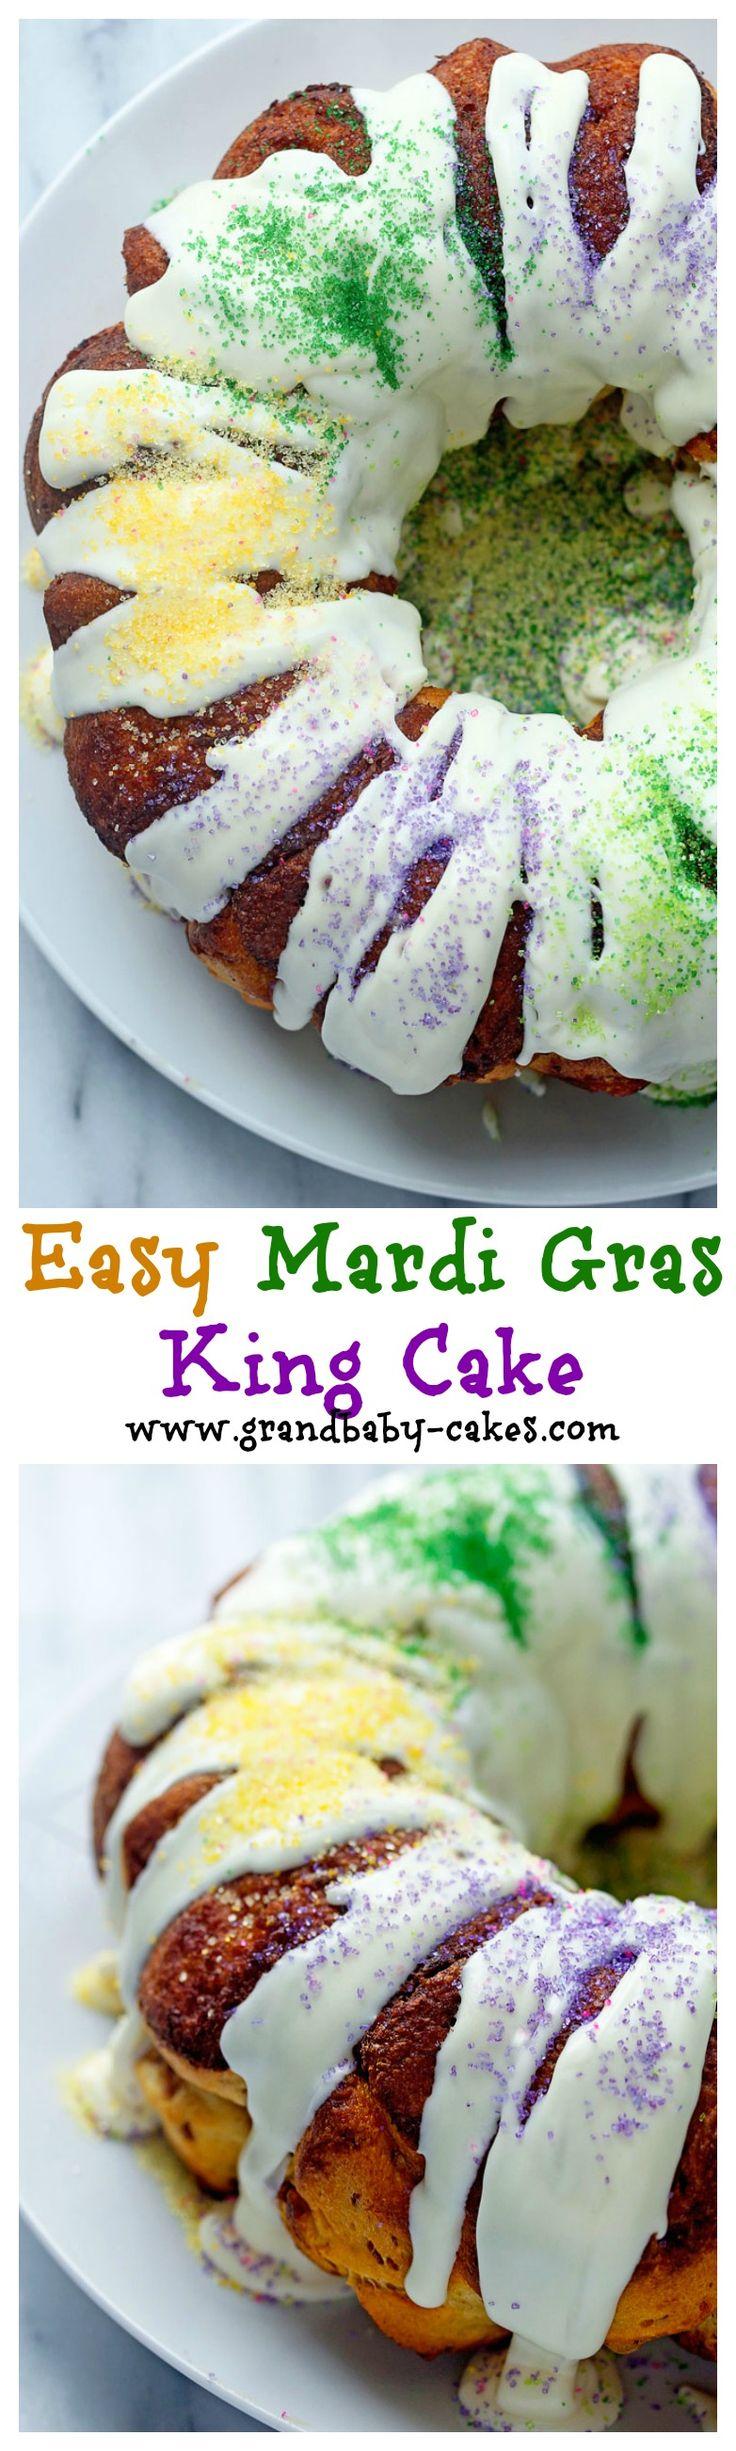 Easy Mardi Gras King Cake | Grandbaby Cakes